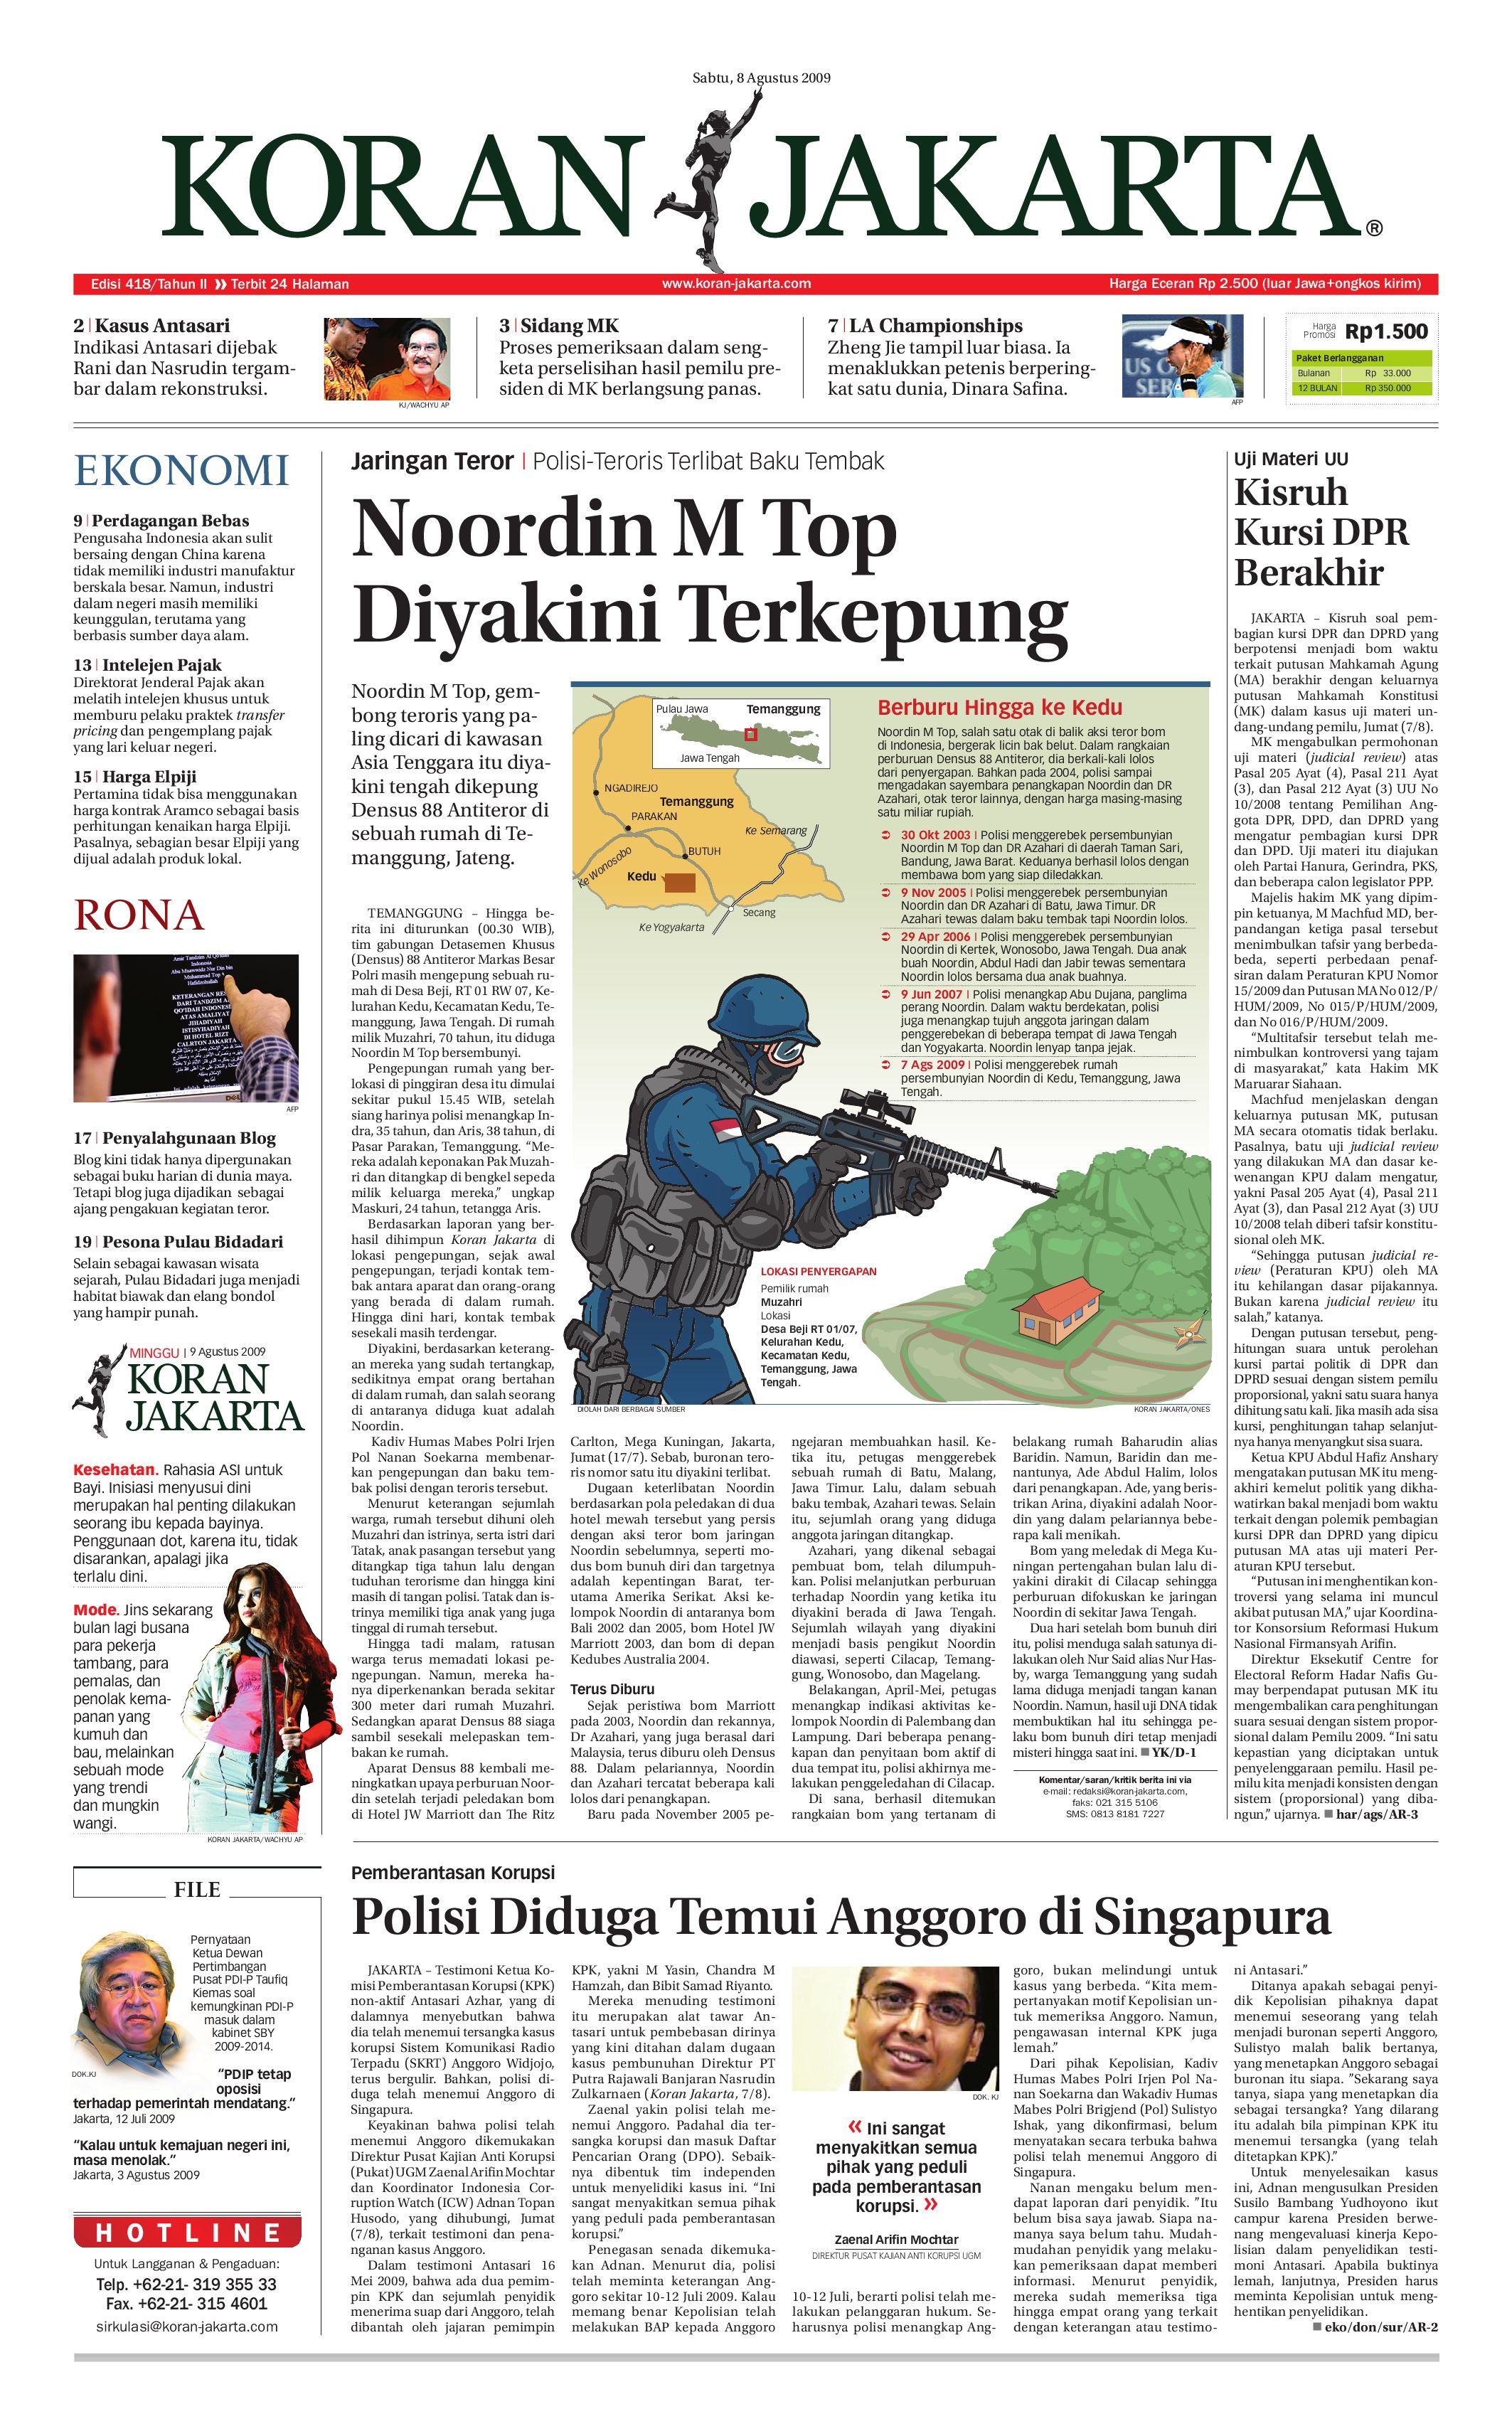 Edisi 418 08 Agustus 2009 By Pt Berita Nusantara Issuu Produk Ukm Bumn Kalung Tenun Wires 12